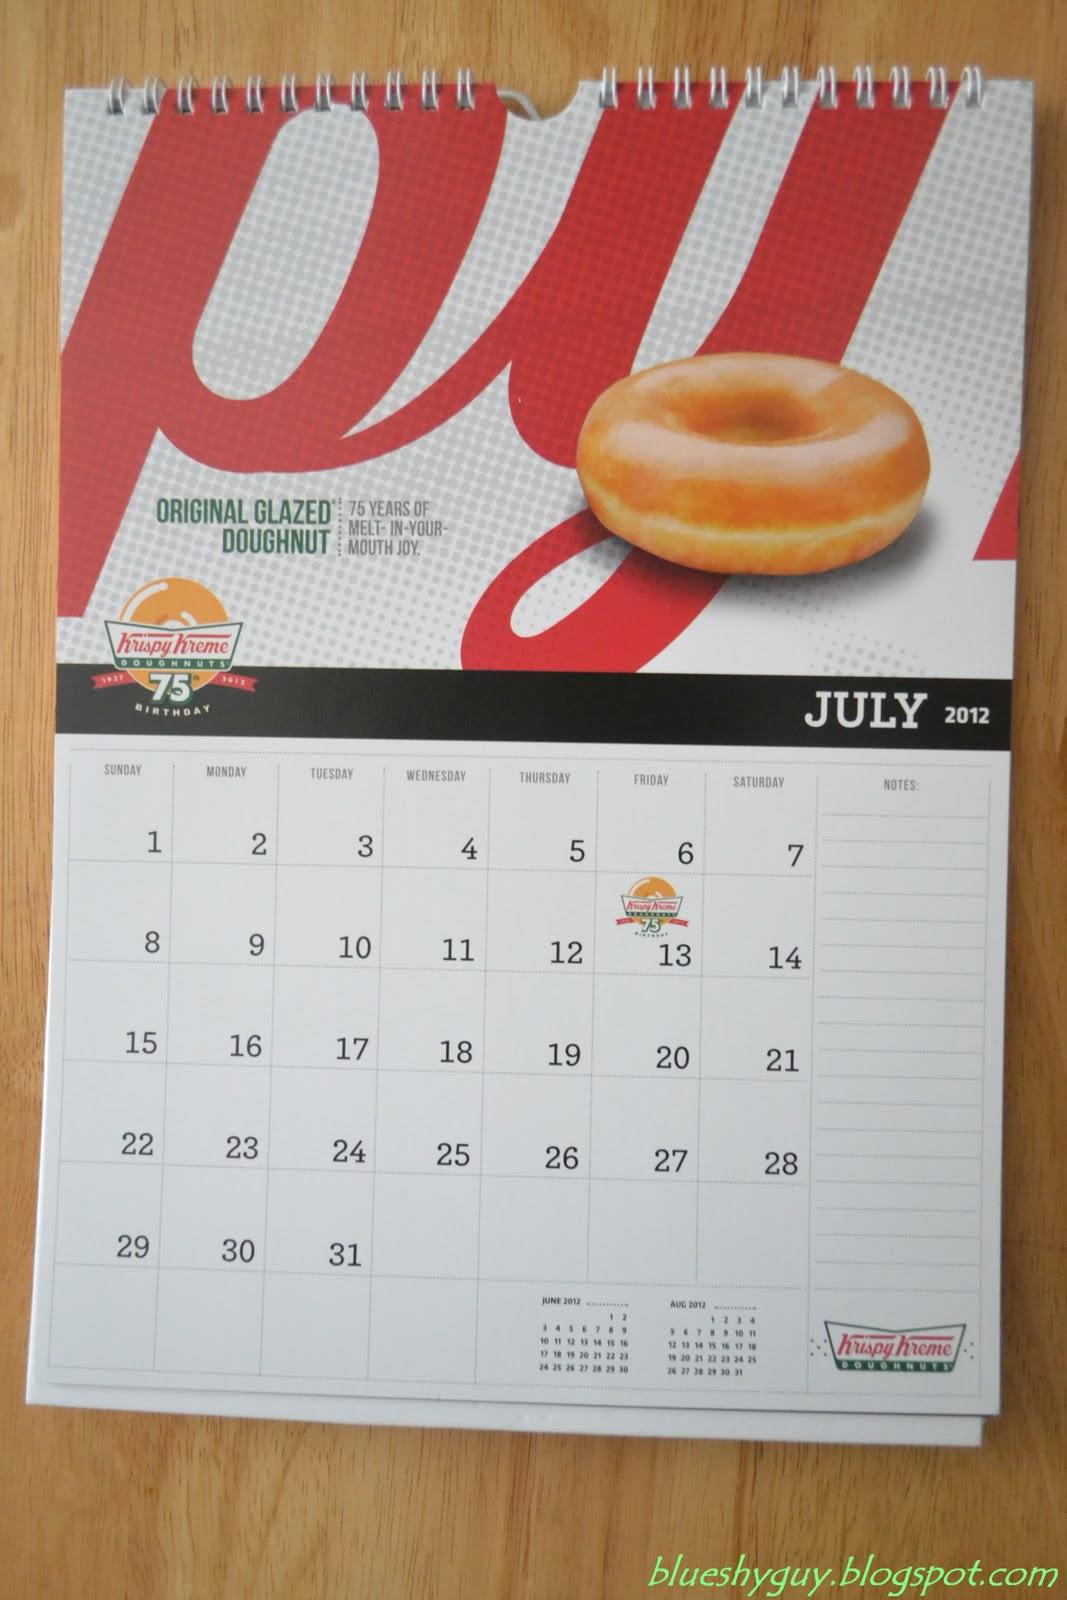 Krispy Kreme Calendar.The Tripper Guy Krispy Kreme 2012 Calendar